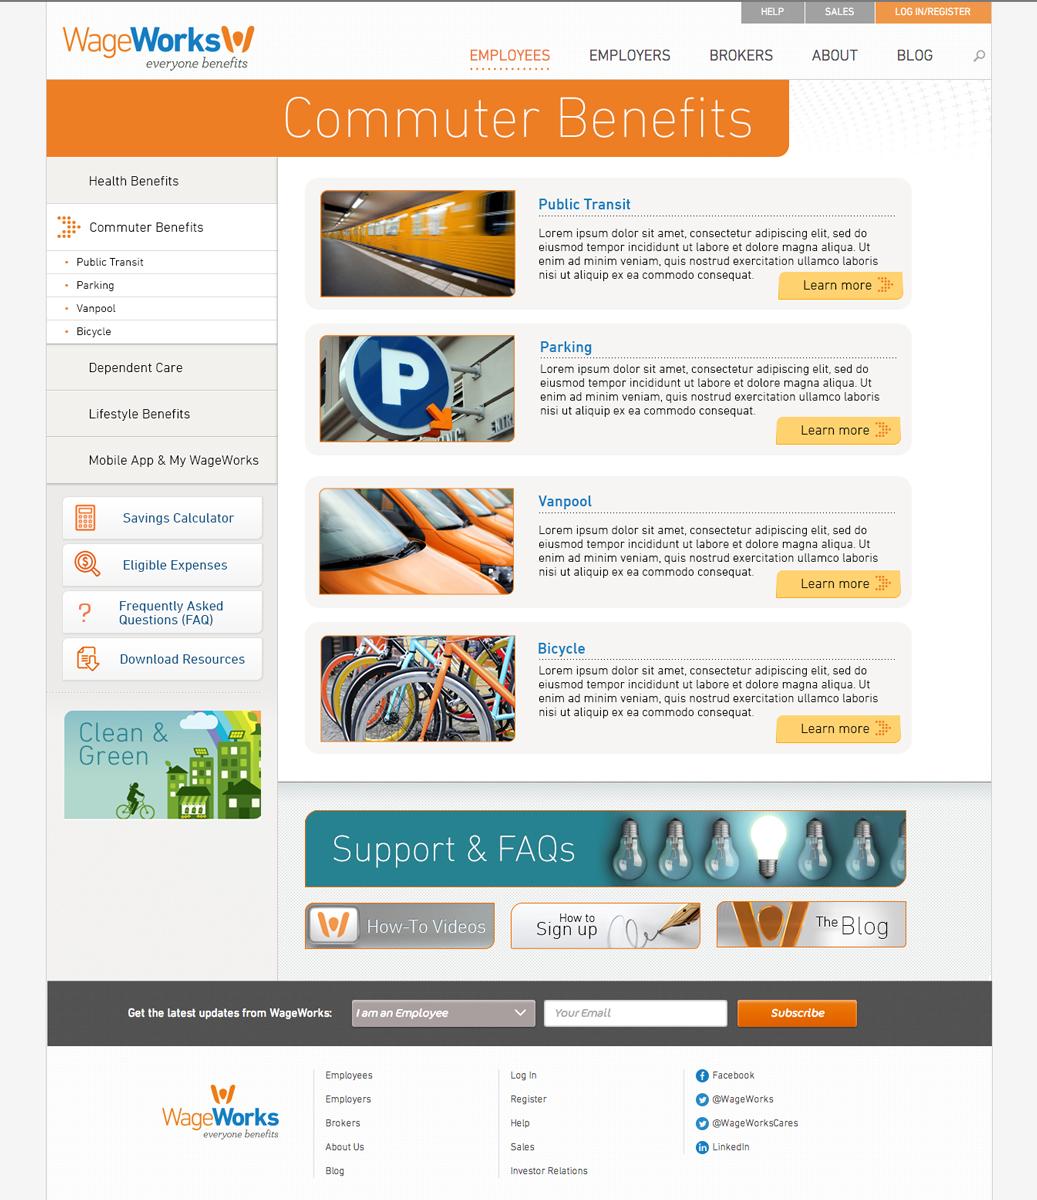 WageWorks Commuter Benefits Landing Page